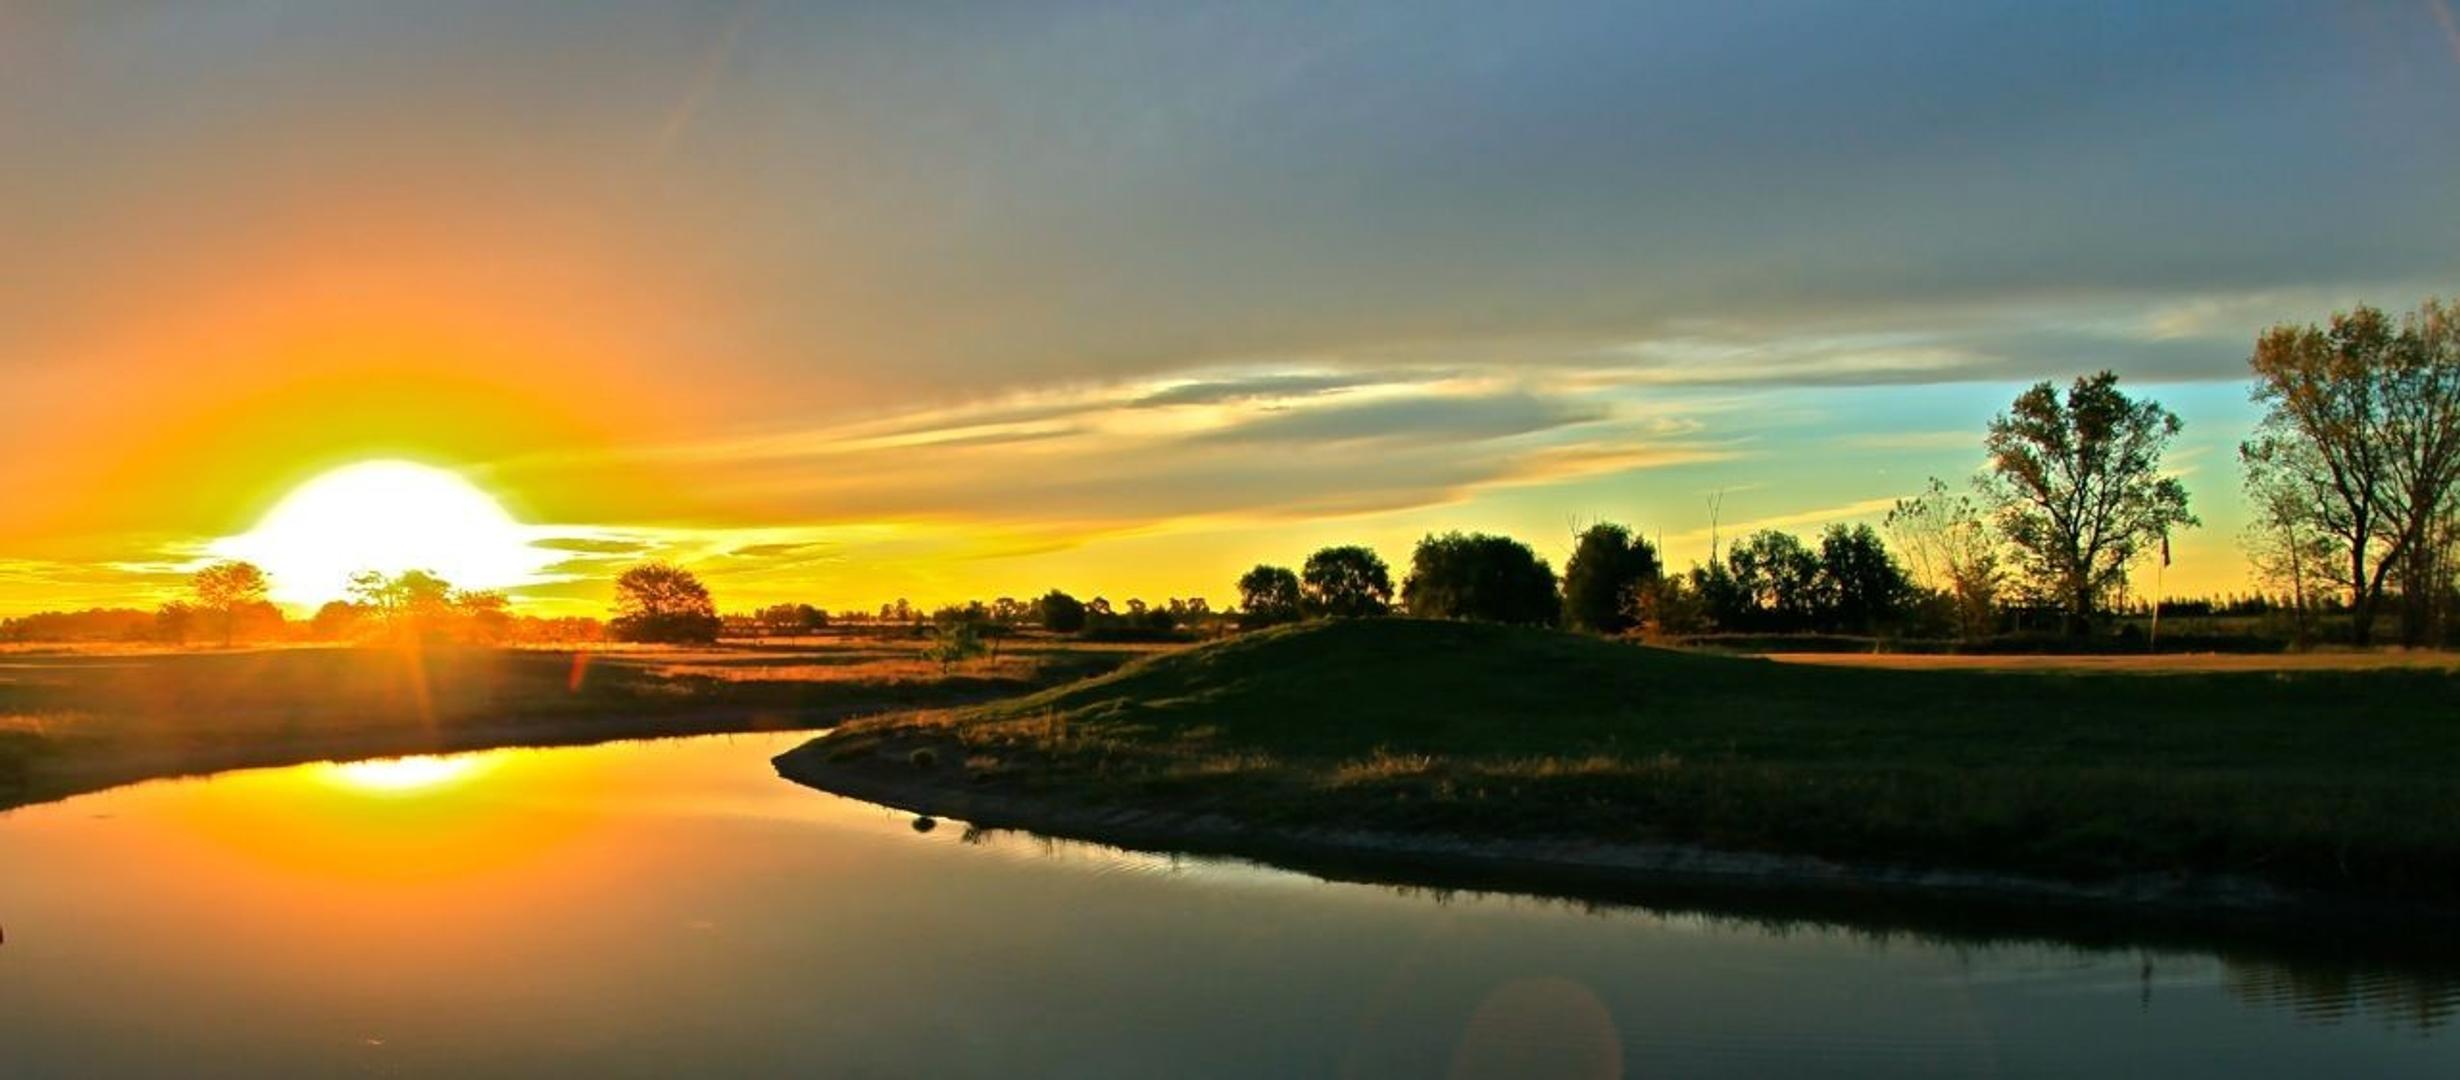 Tizado Pilar vende lotes al golf en Medal CC, Pilar y Alrededores - PIL3849_LP172636_1